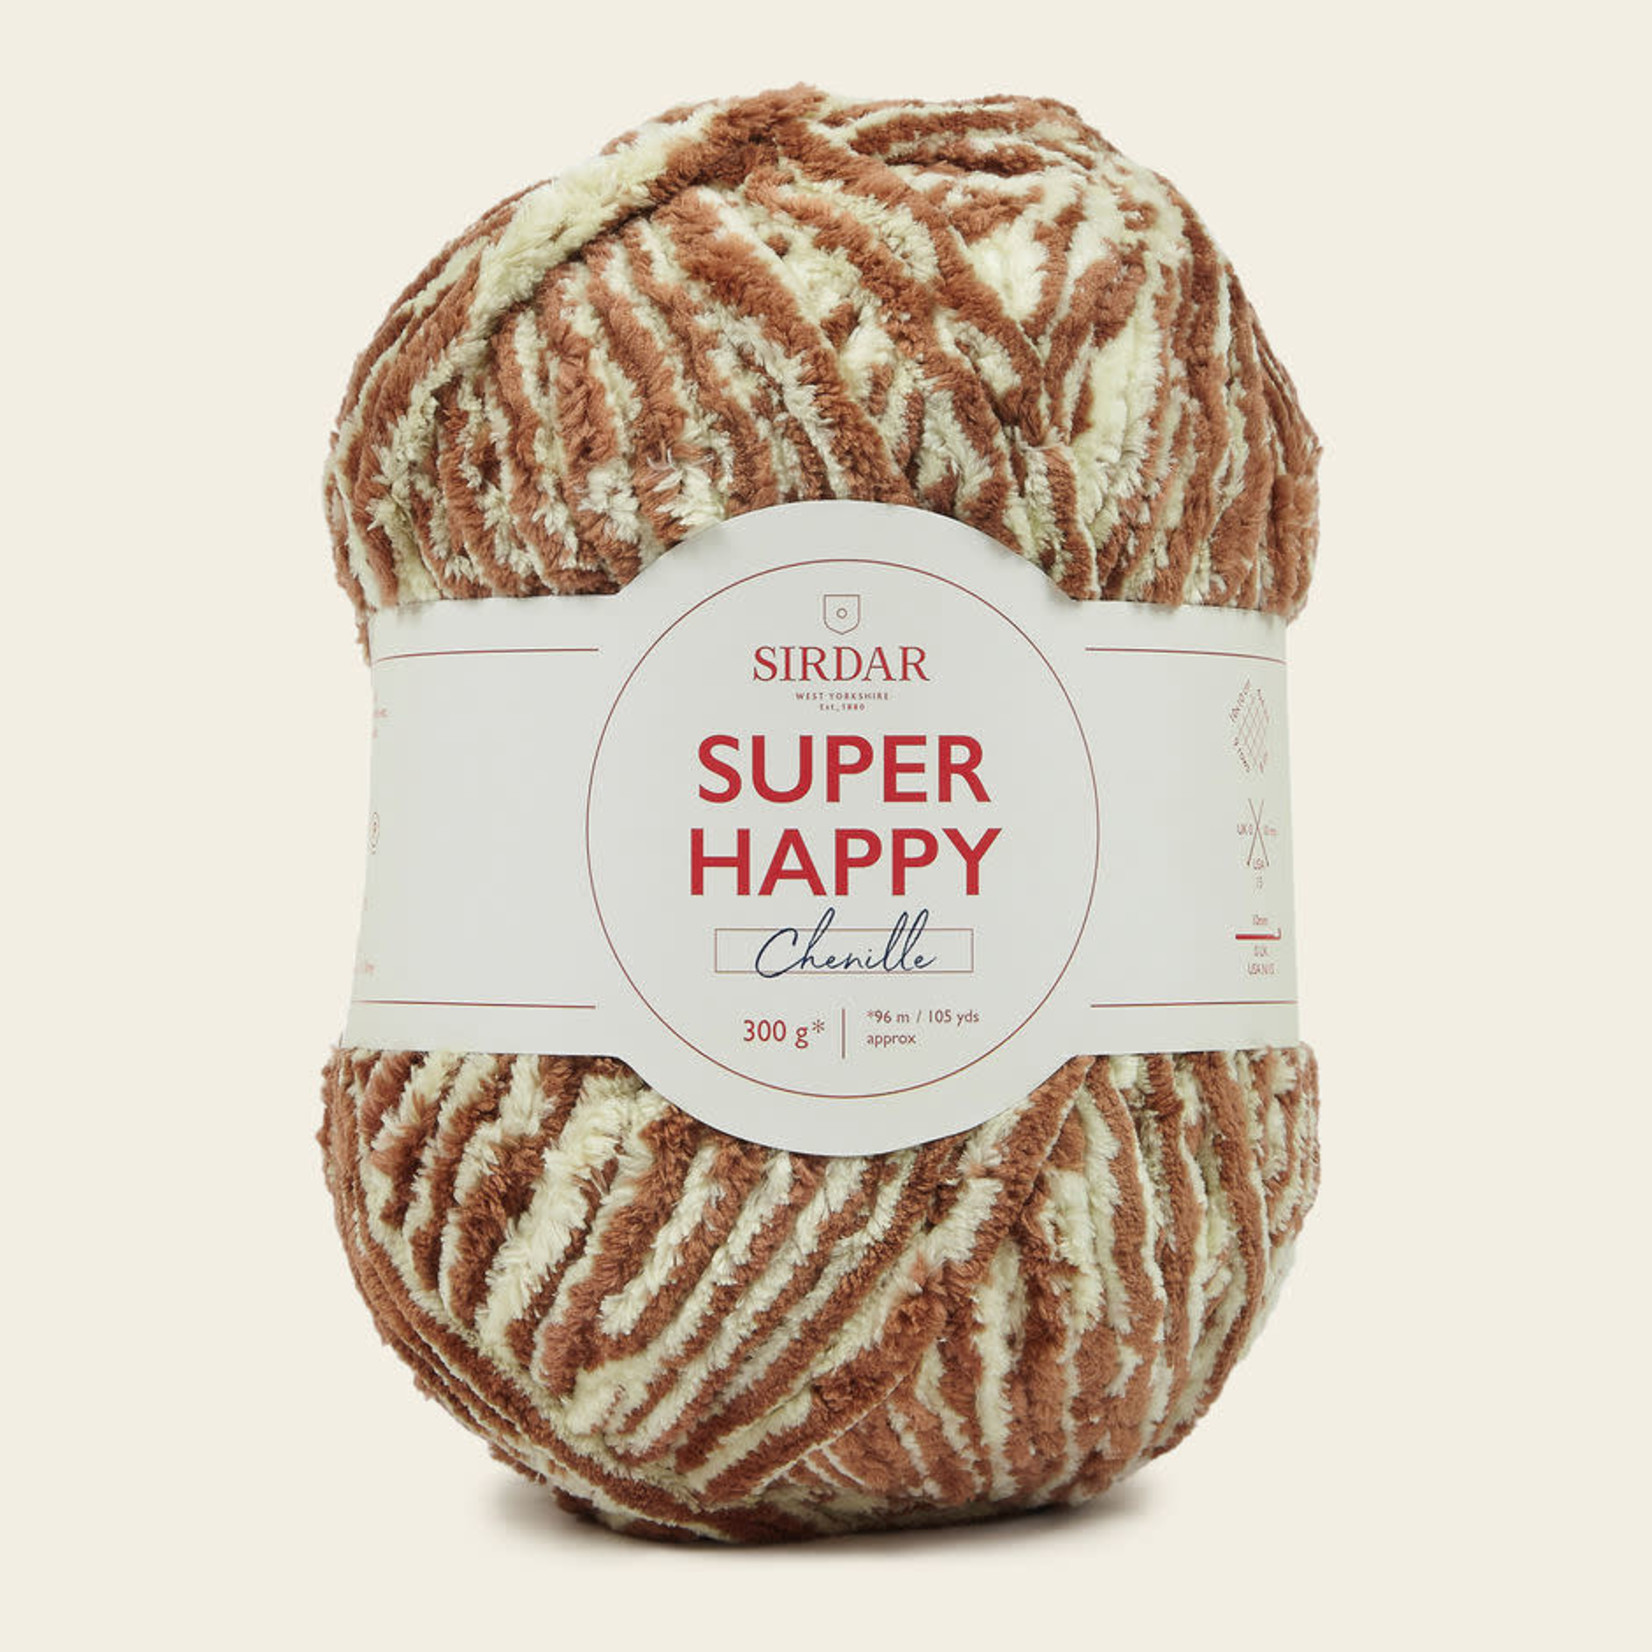 Sirdar Super Happy Chenille